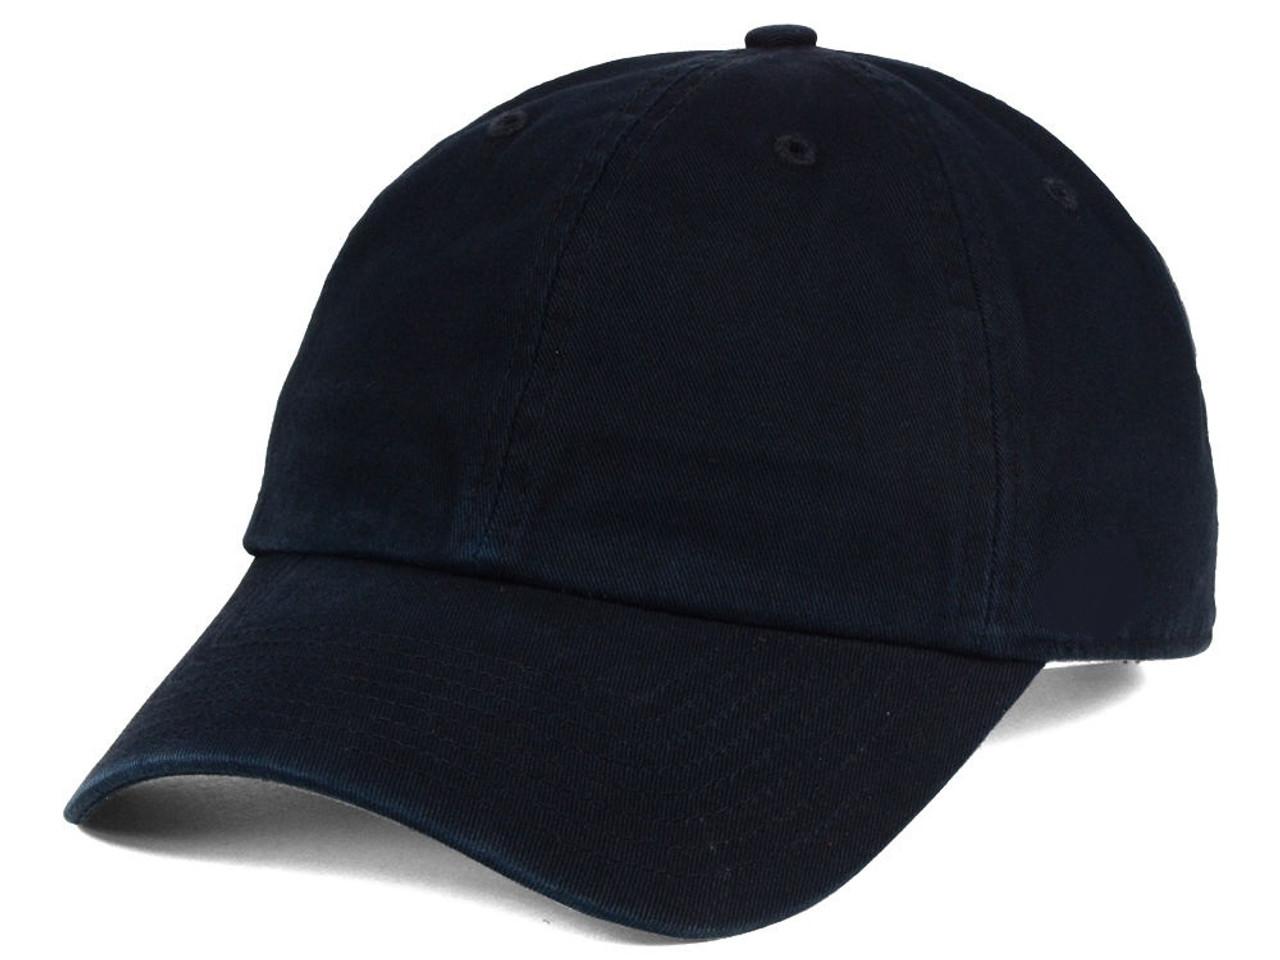 2c861b325877f Hyland Headwear Tactical Cap - Hero Outdoors